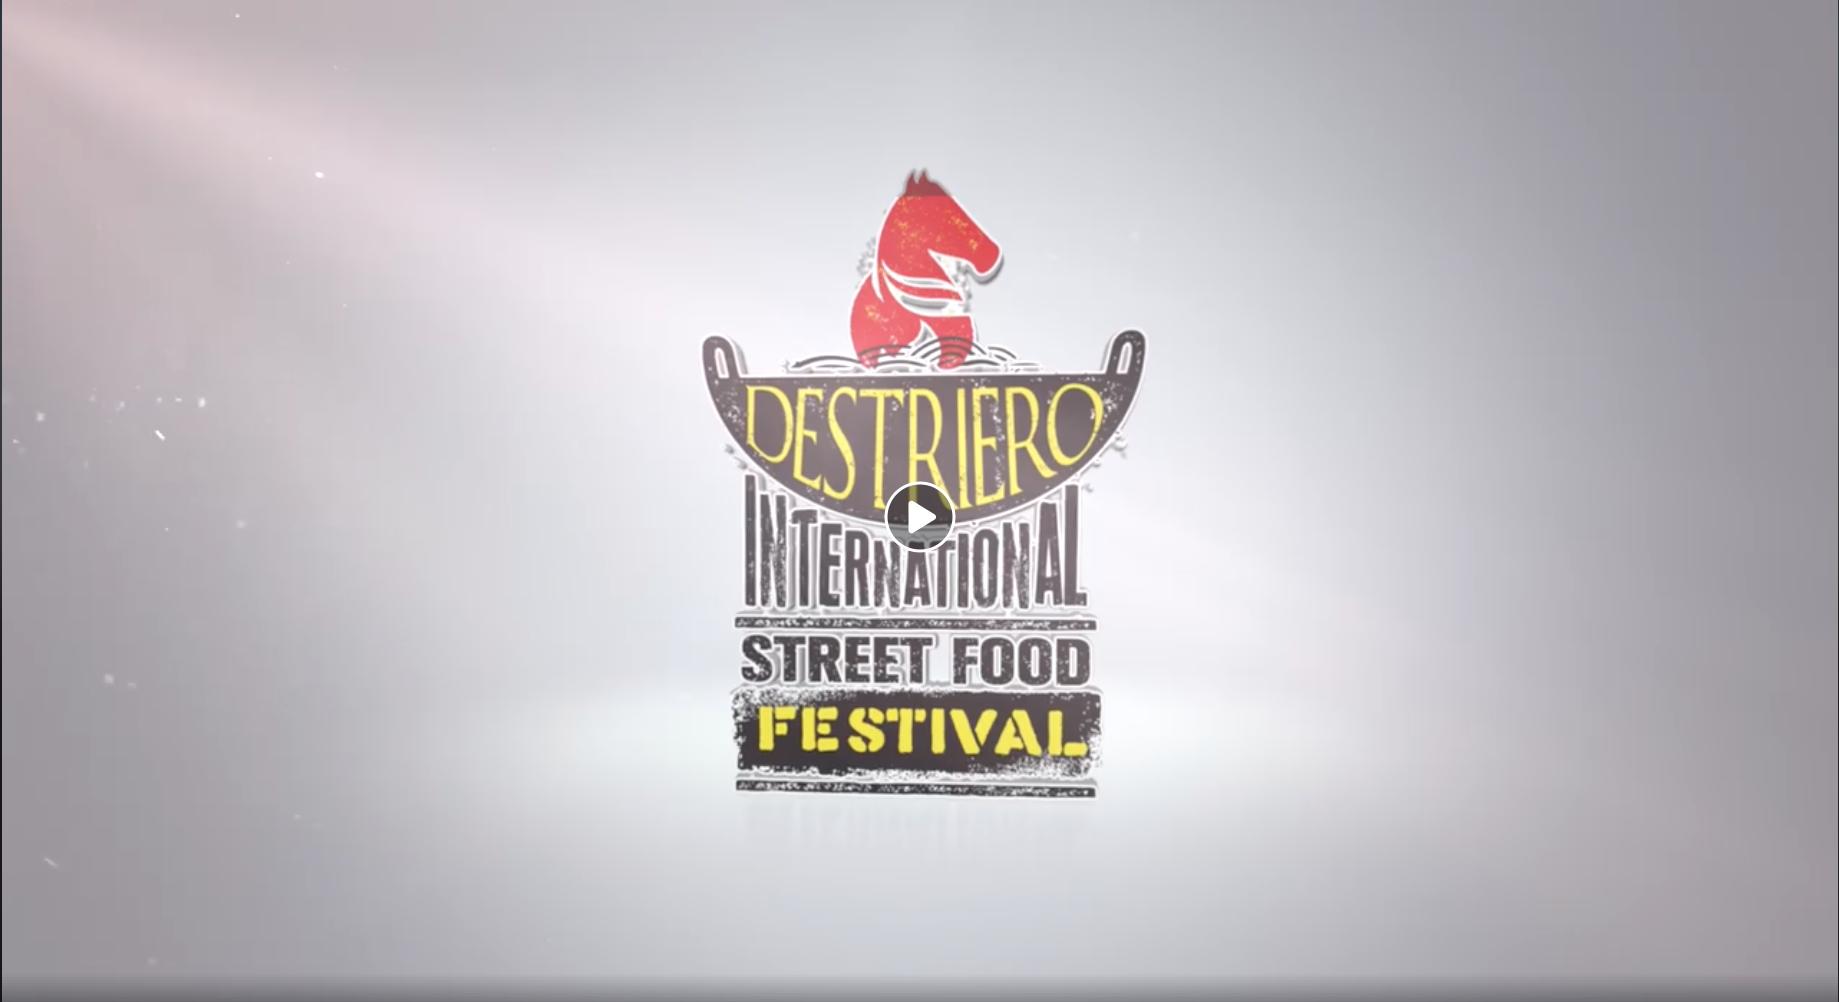 Destriero Intarnational Street Food